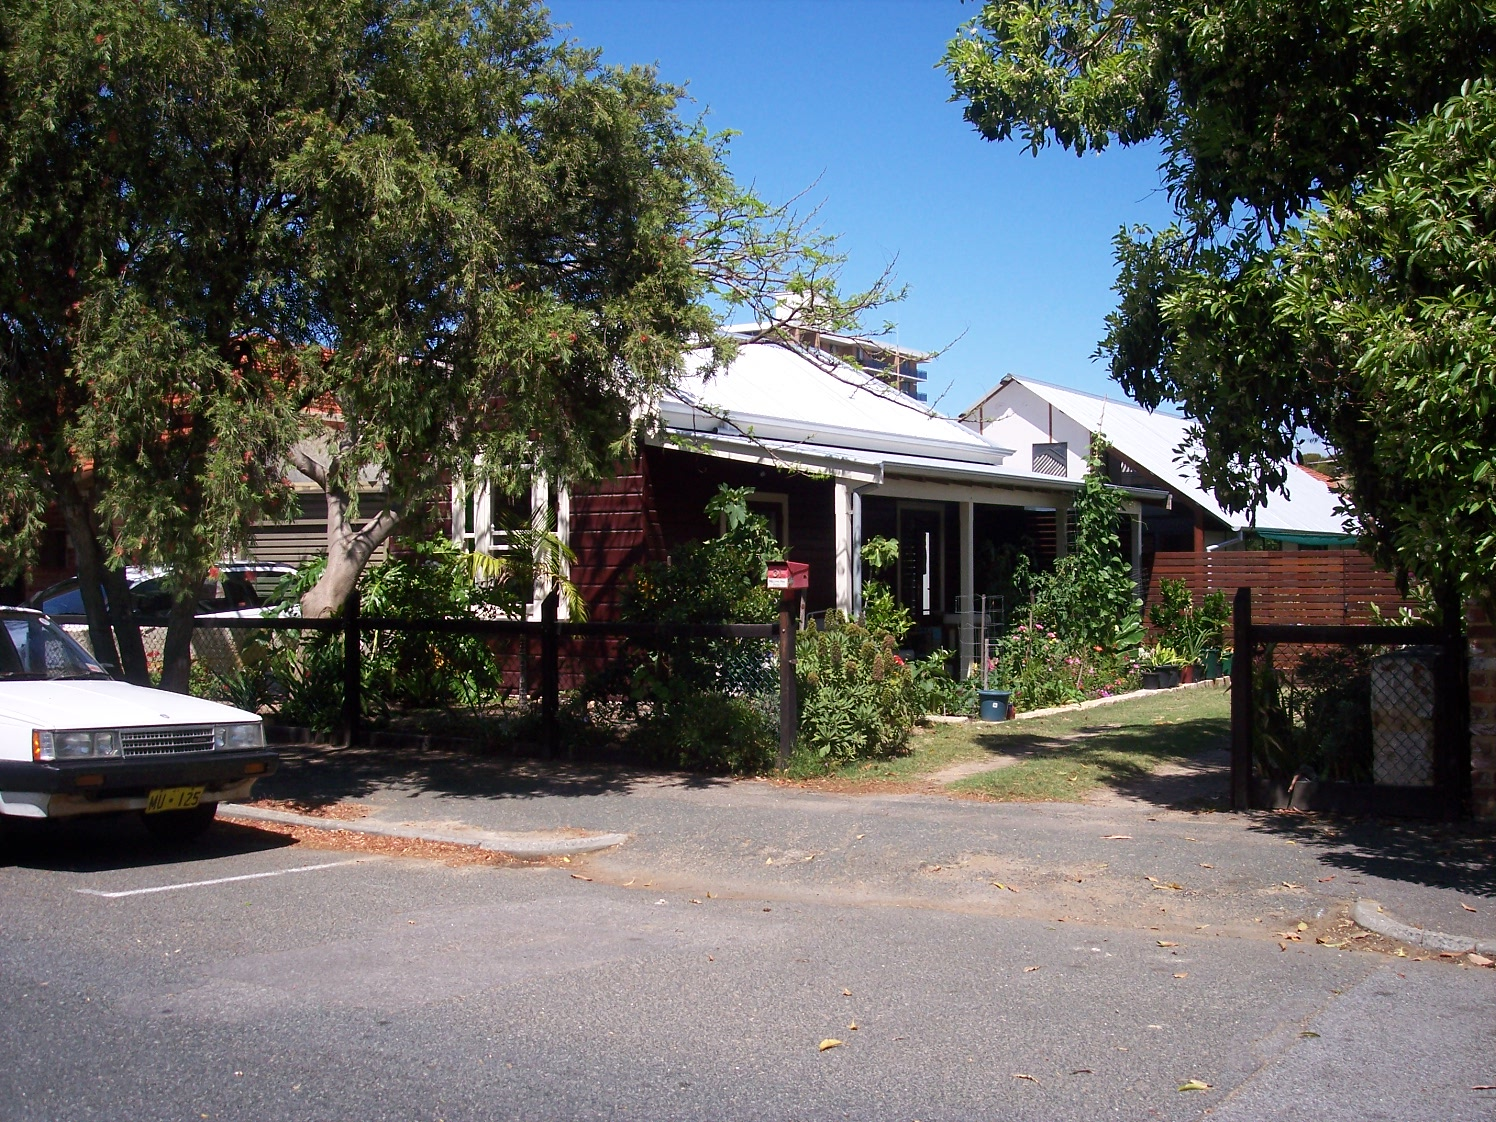 16-11-06 View WSW 31 Hubble Street.jpg